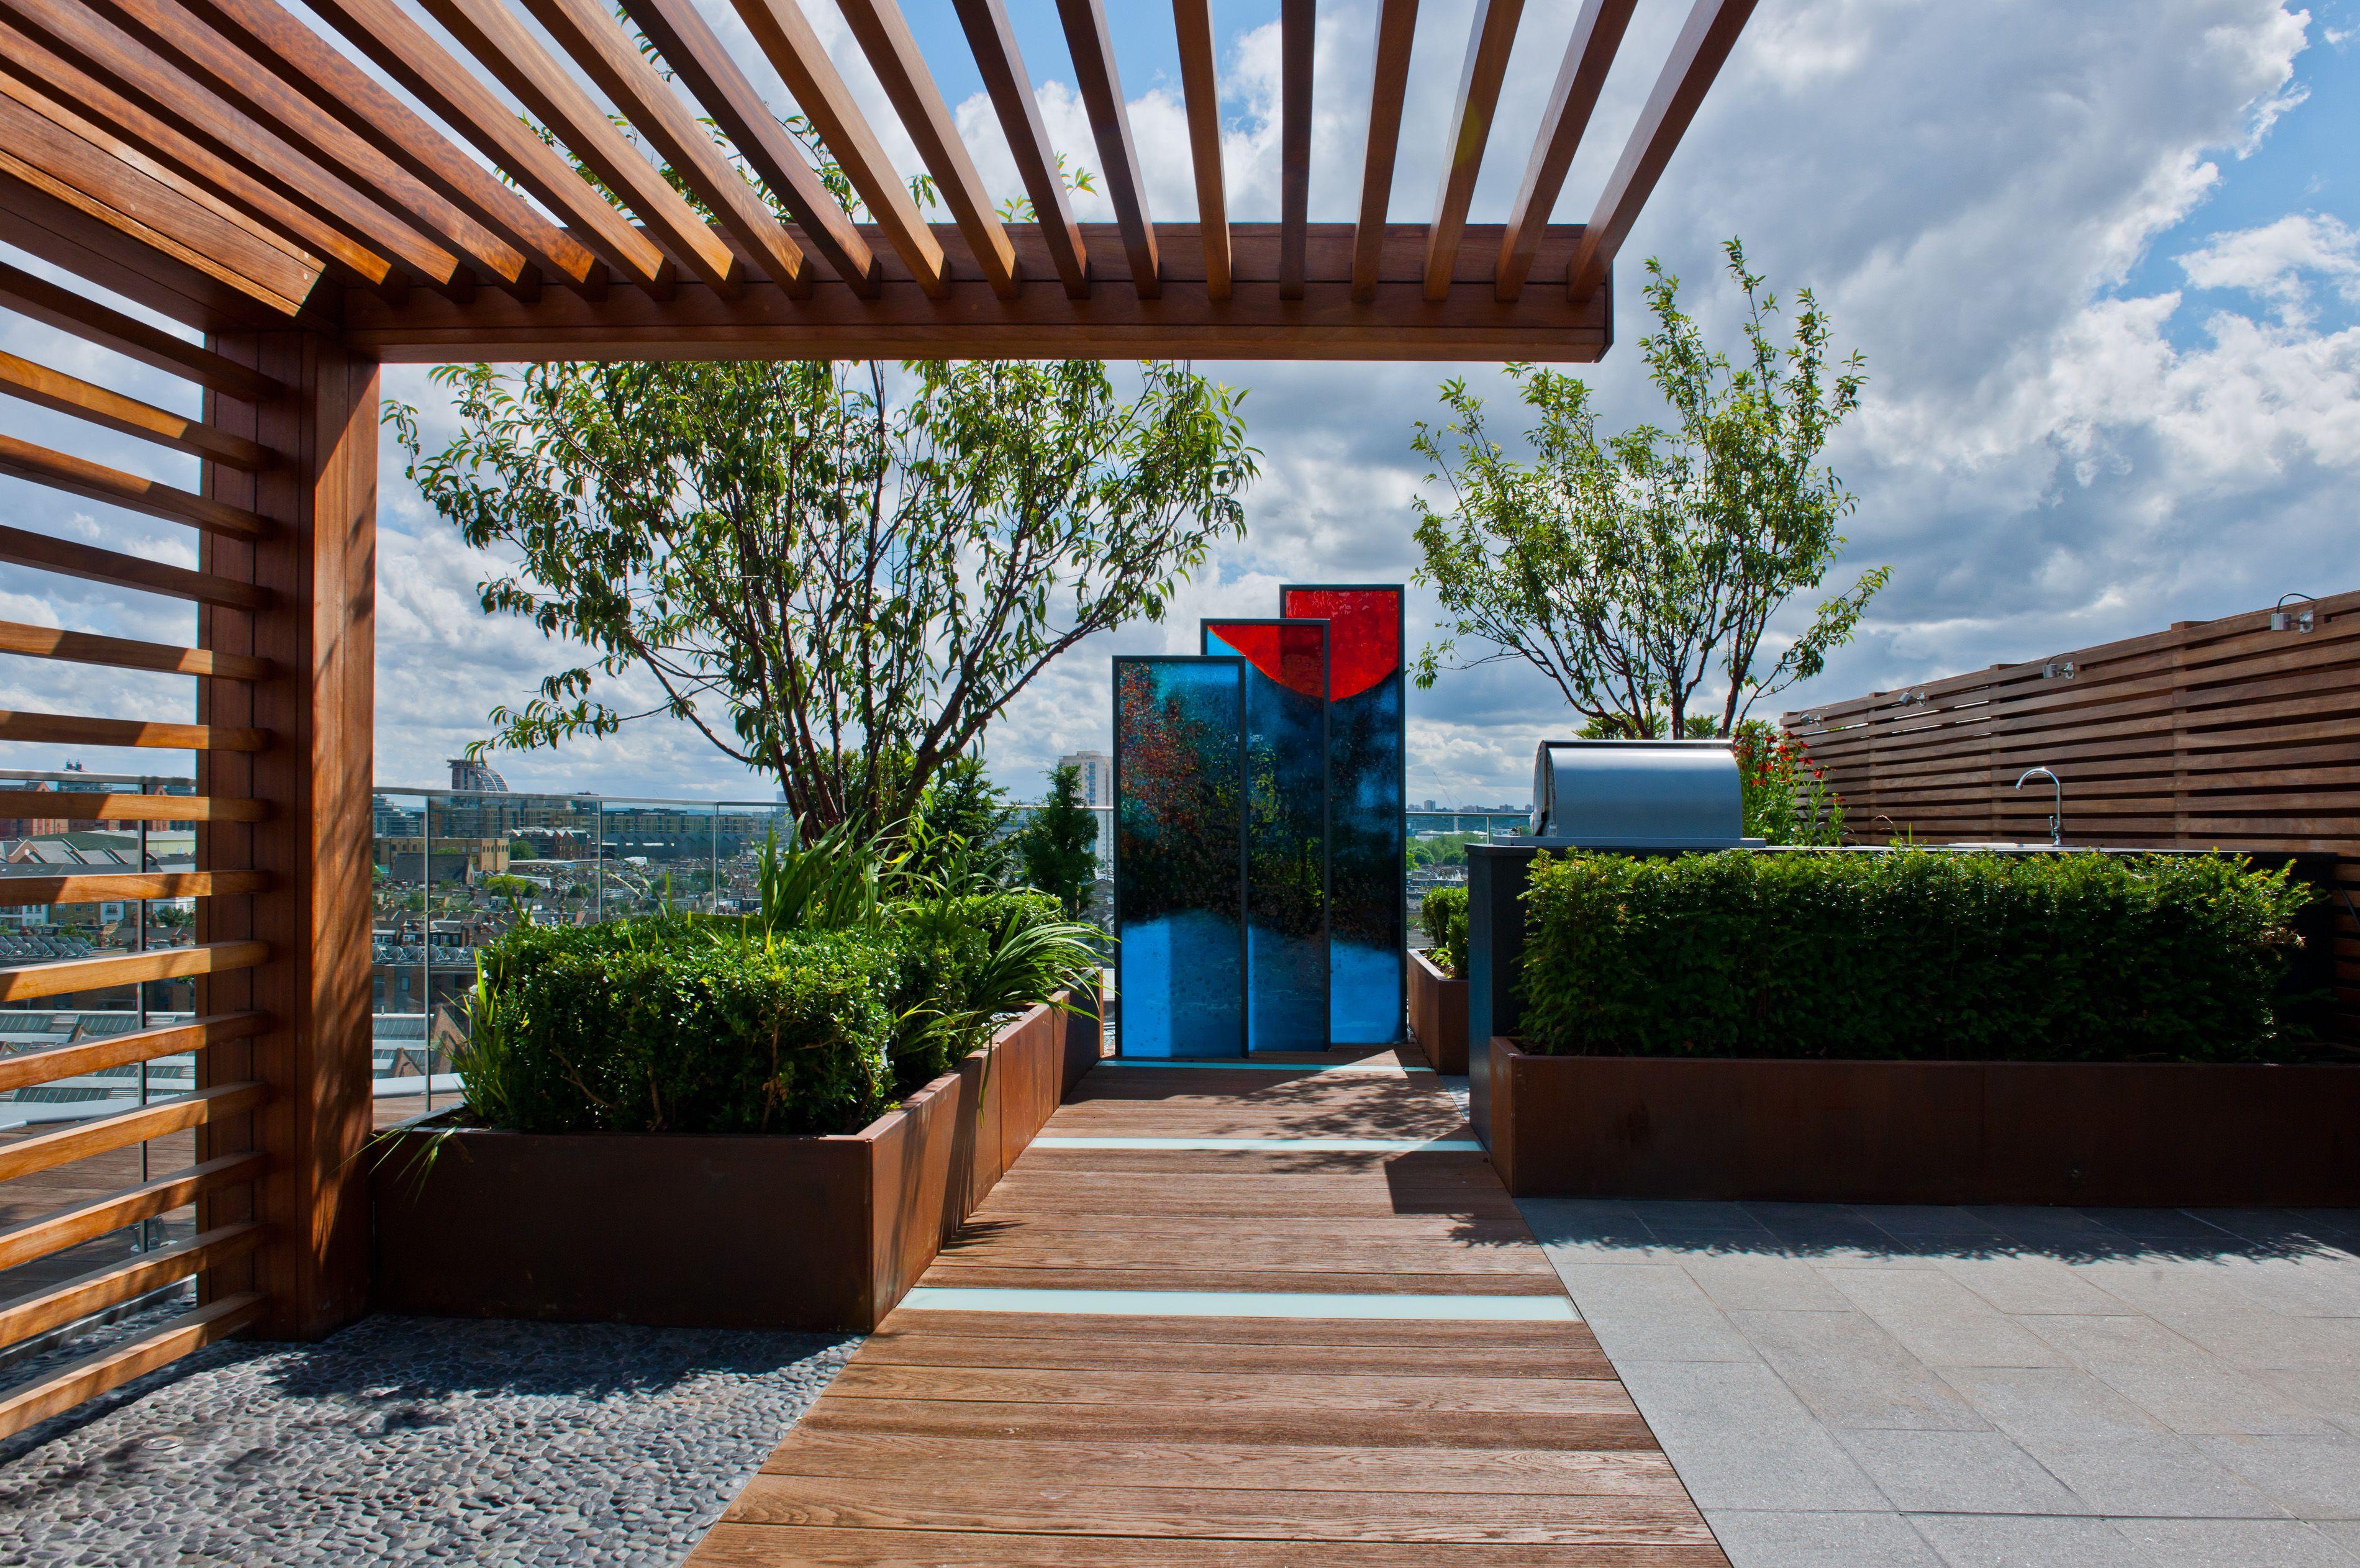 Merveilleux Front Porch Pergola Design Ideas And Decor Image Of Pictures ~ Cubtab